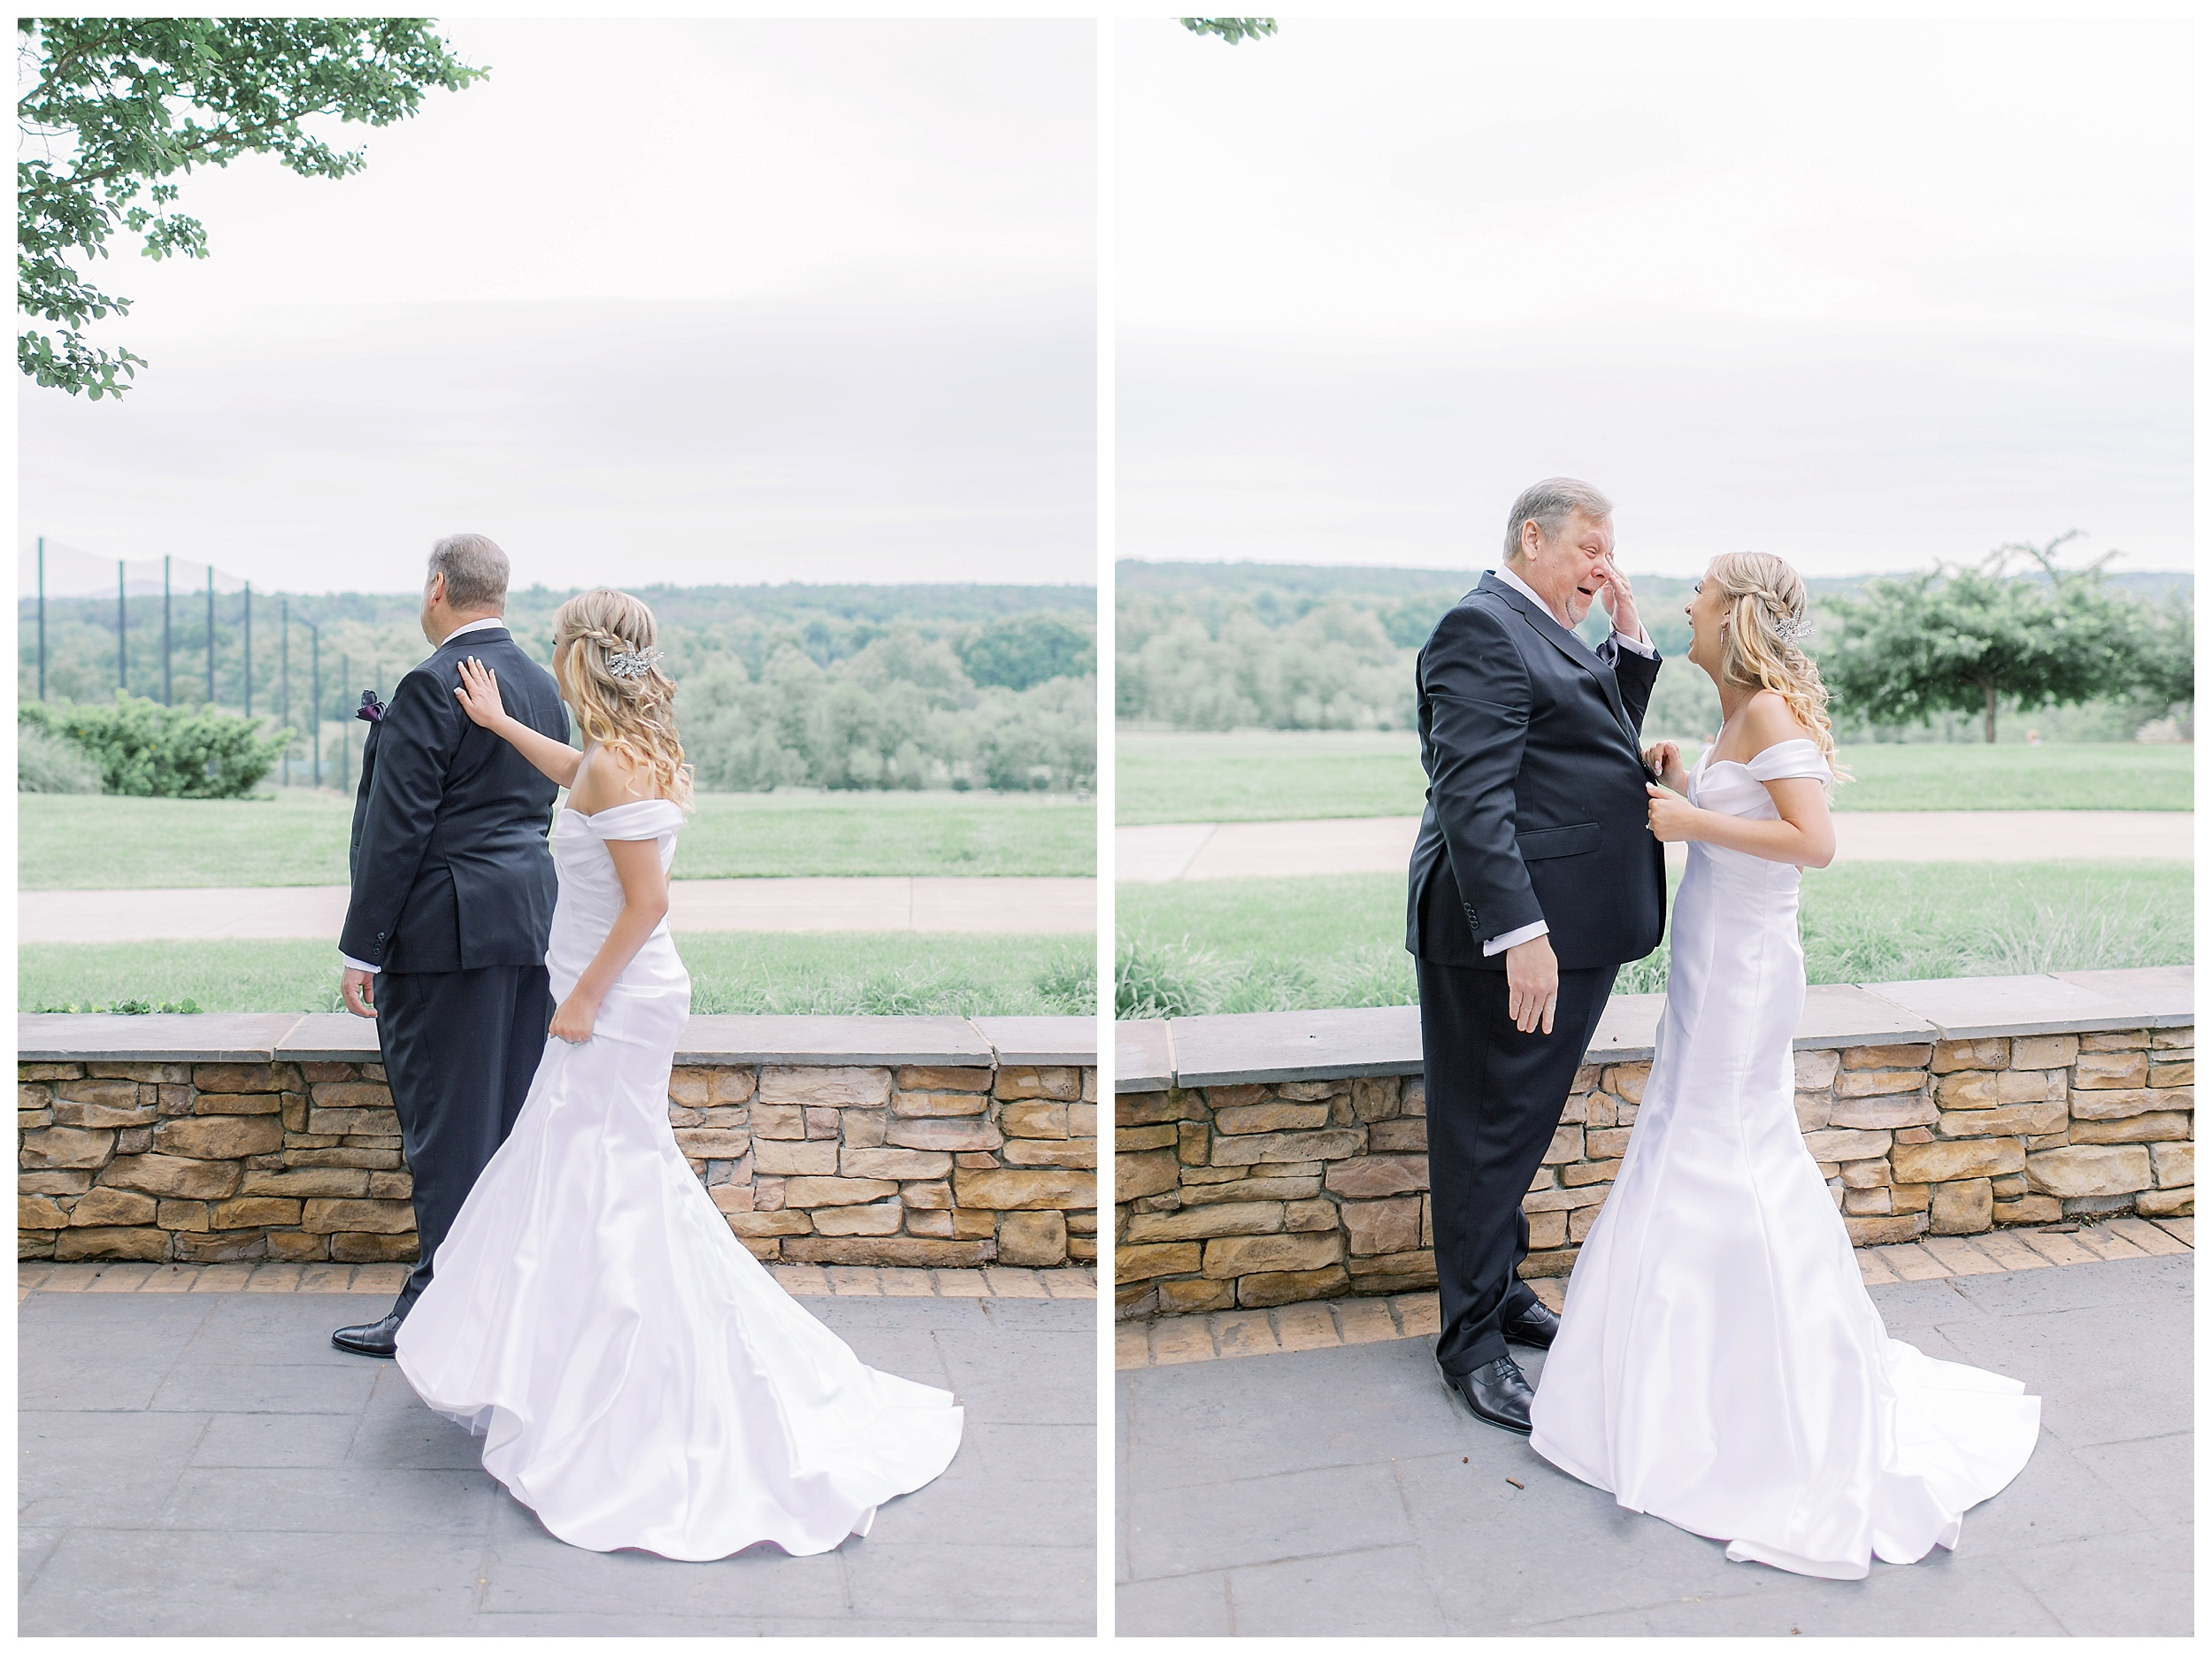 Lansdowne Resort Wedding | Virginia Film Wedding Photographer Kir Tuben_0021.jpg